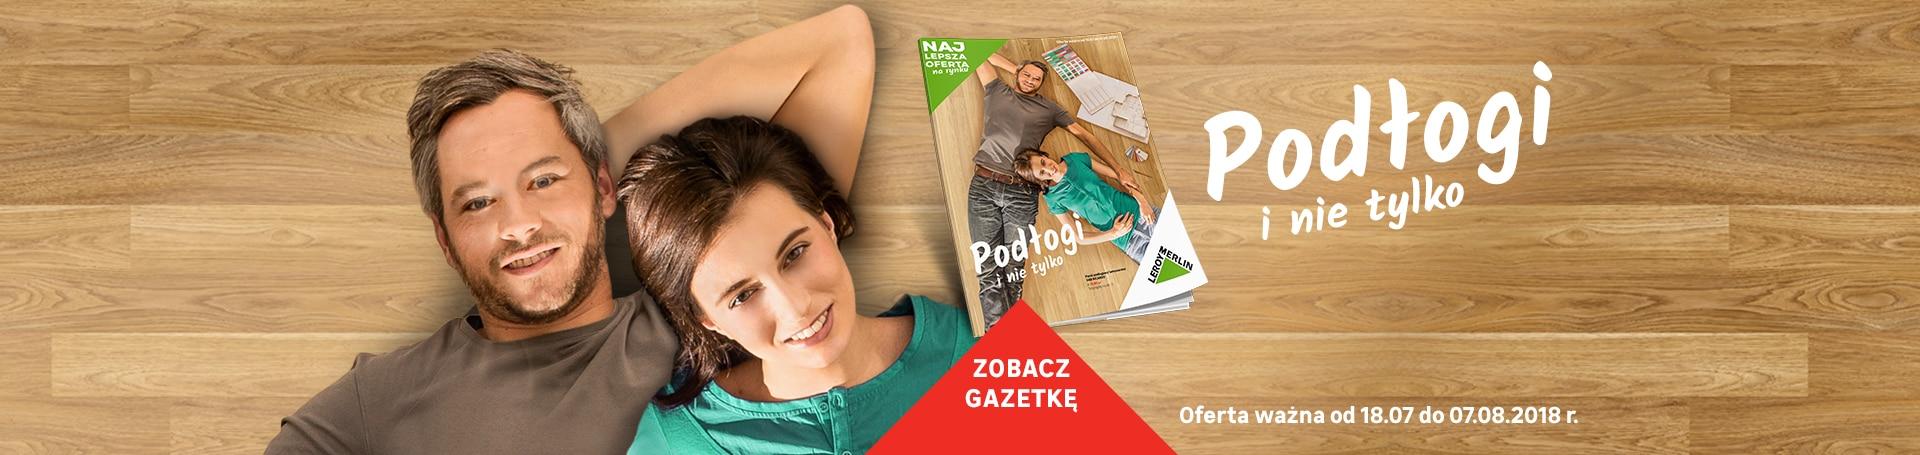 rr-gazetka-ah12-18.07-7.08.2018